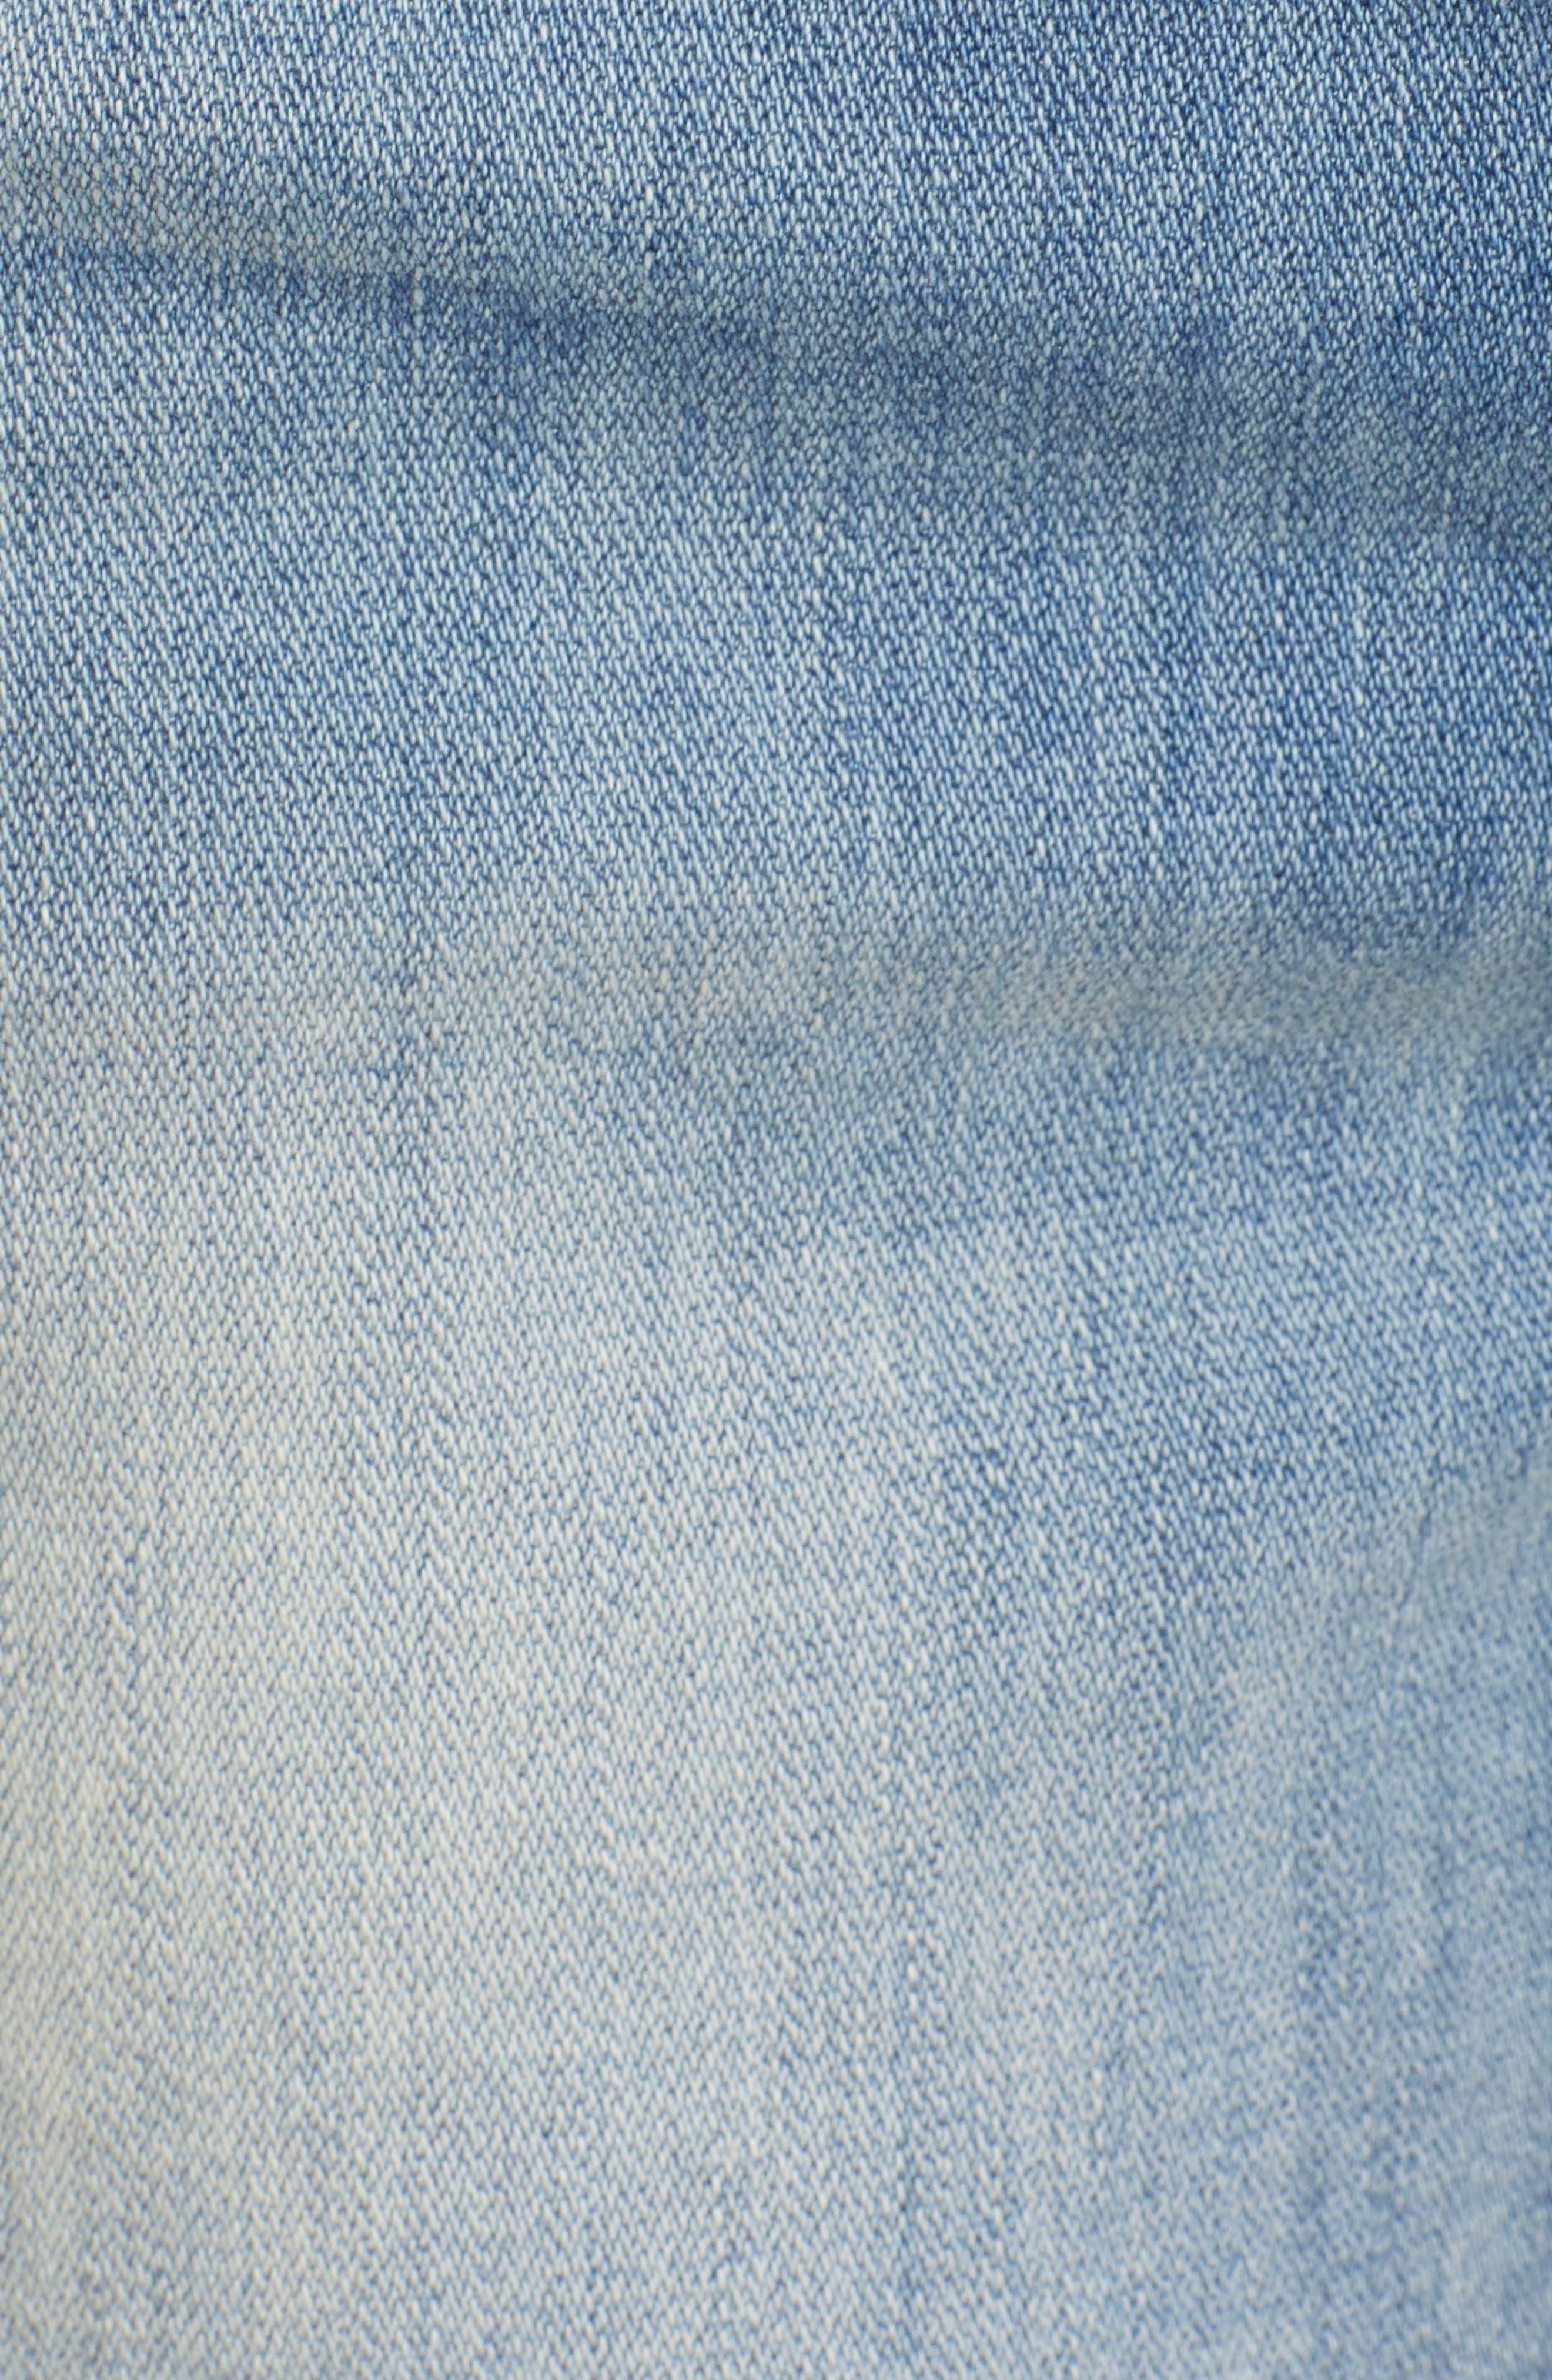 Fray Outseam Denim Shorts,                             Alternate thumbnail 6, color,                             Medium Wash